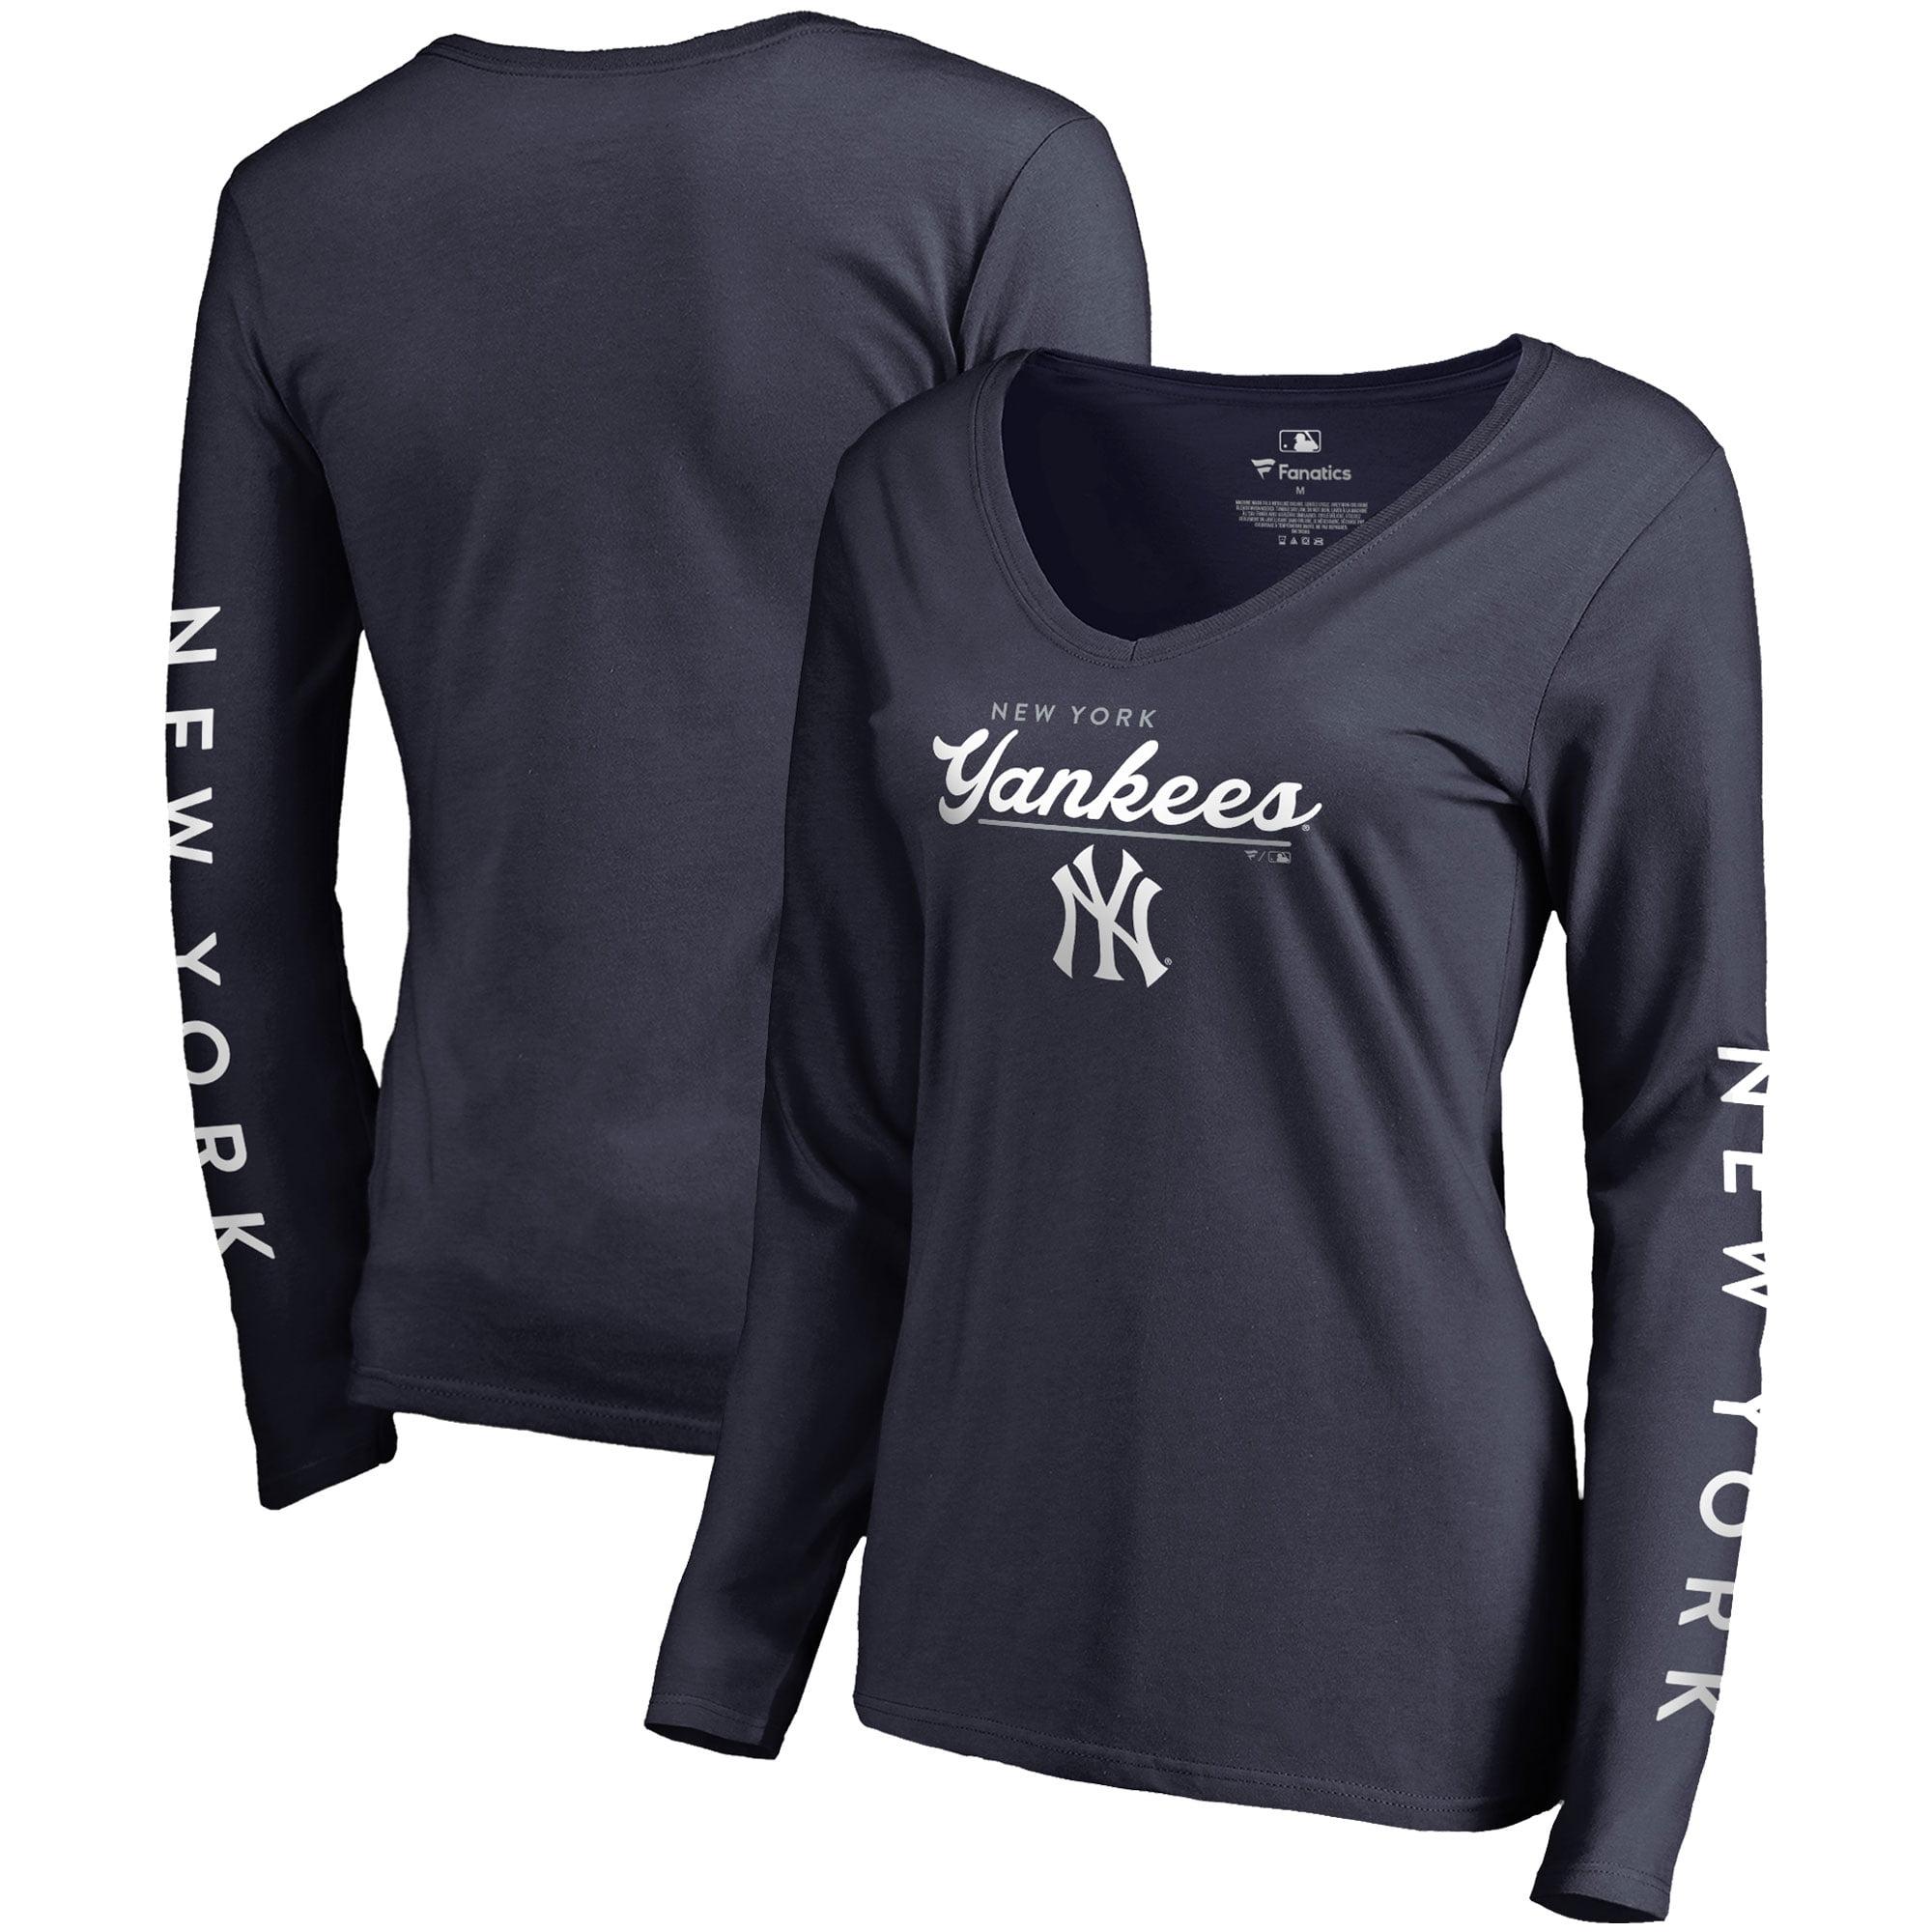 New York Yankees Fanatics Branded Women's High Class Long Sleeve V-Neck T-Shirt Navy by BOX SEAT CLOTHING CO.